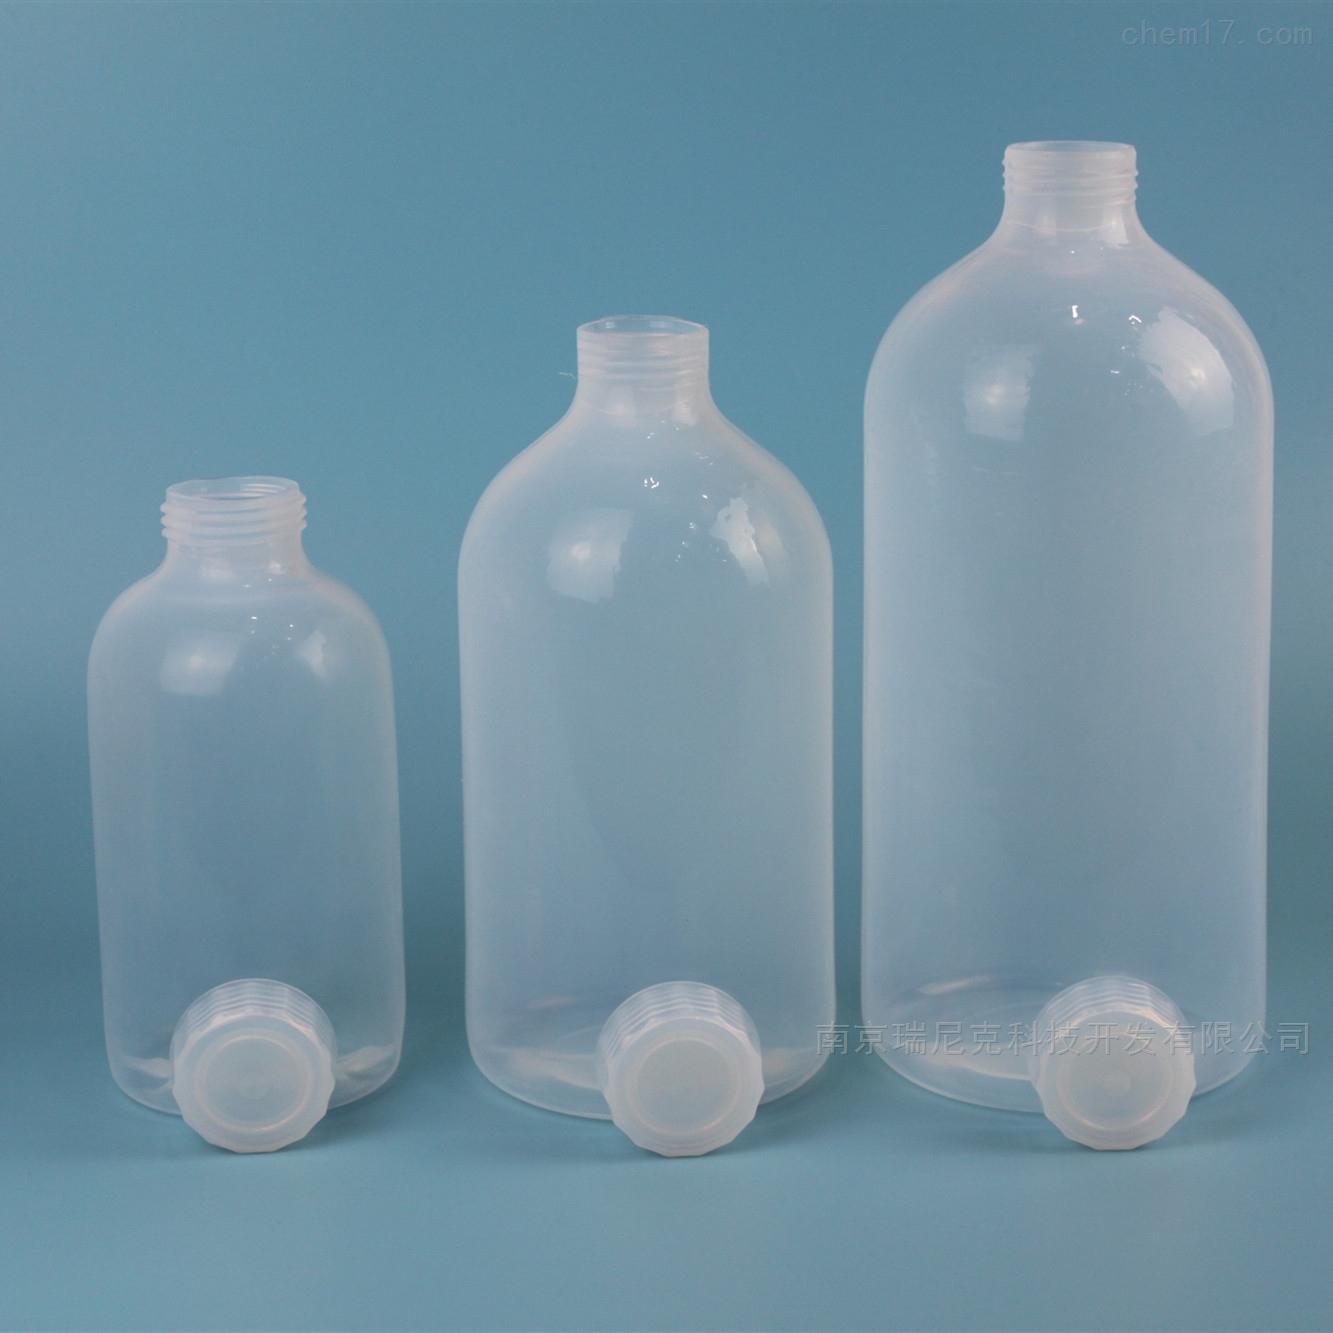 PFA试剂瓶100ml